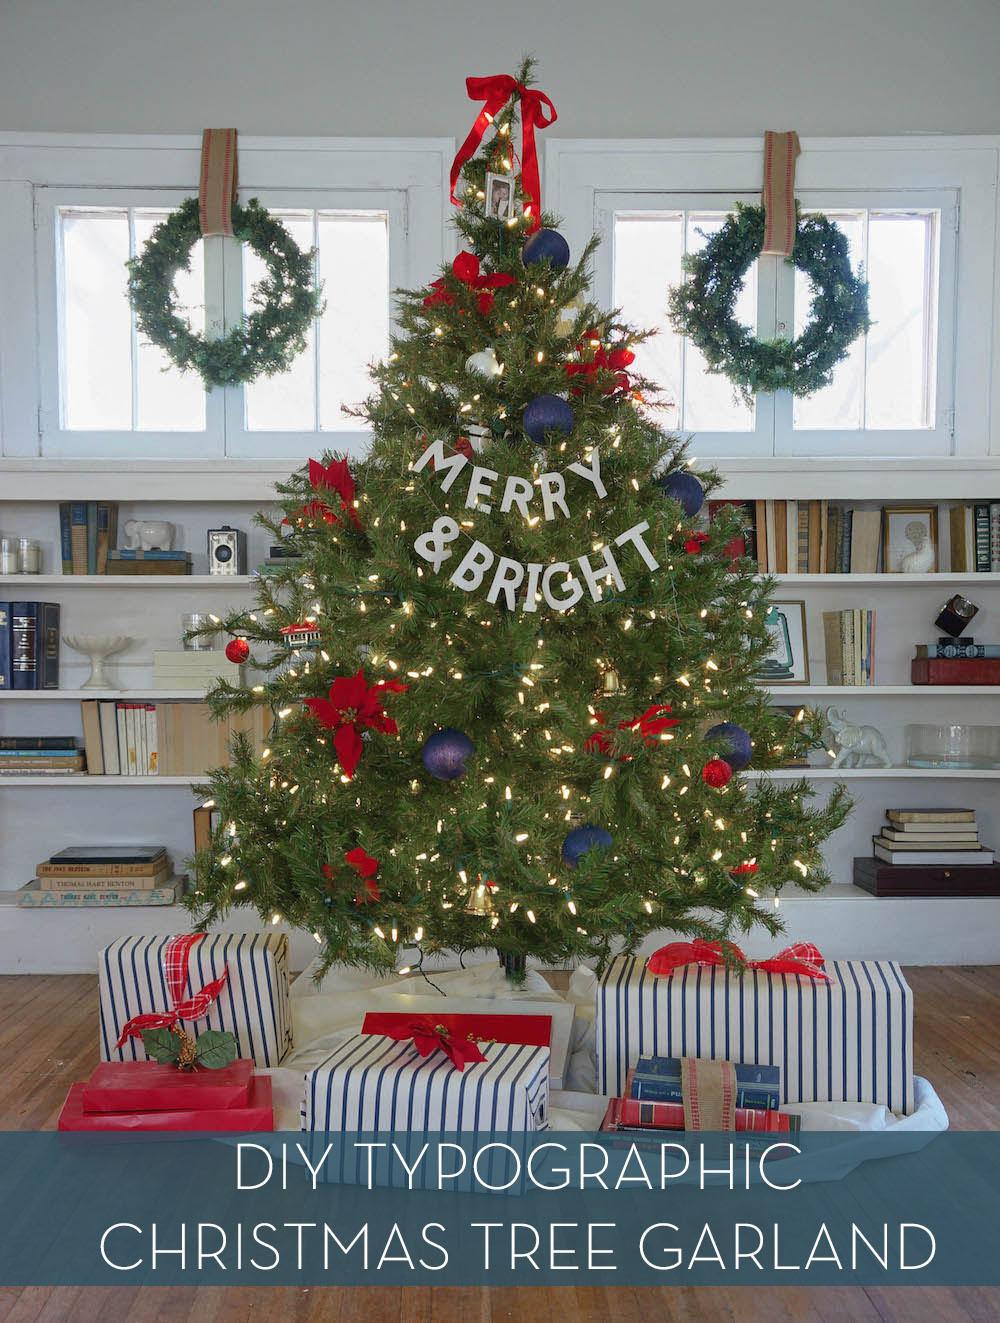 DIY Christmas Tree Garland  Make It DIY Christmas Tree Typographic Garland